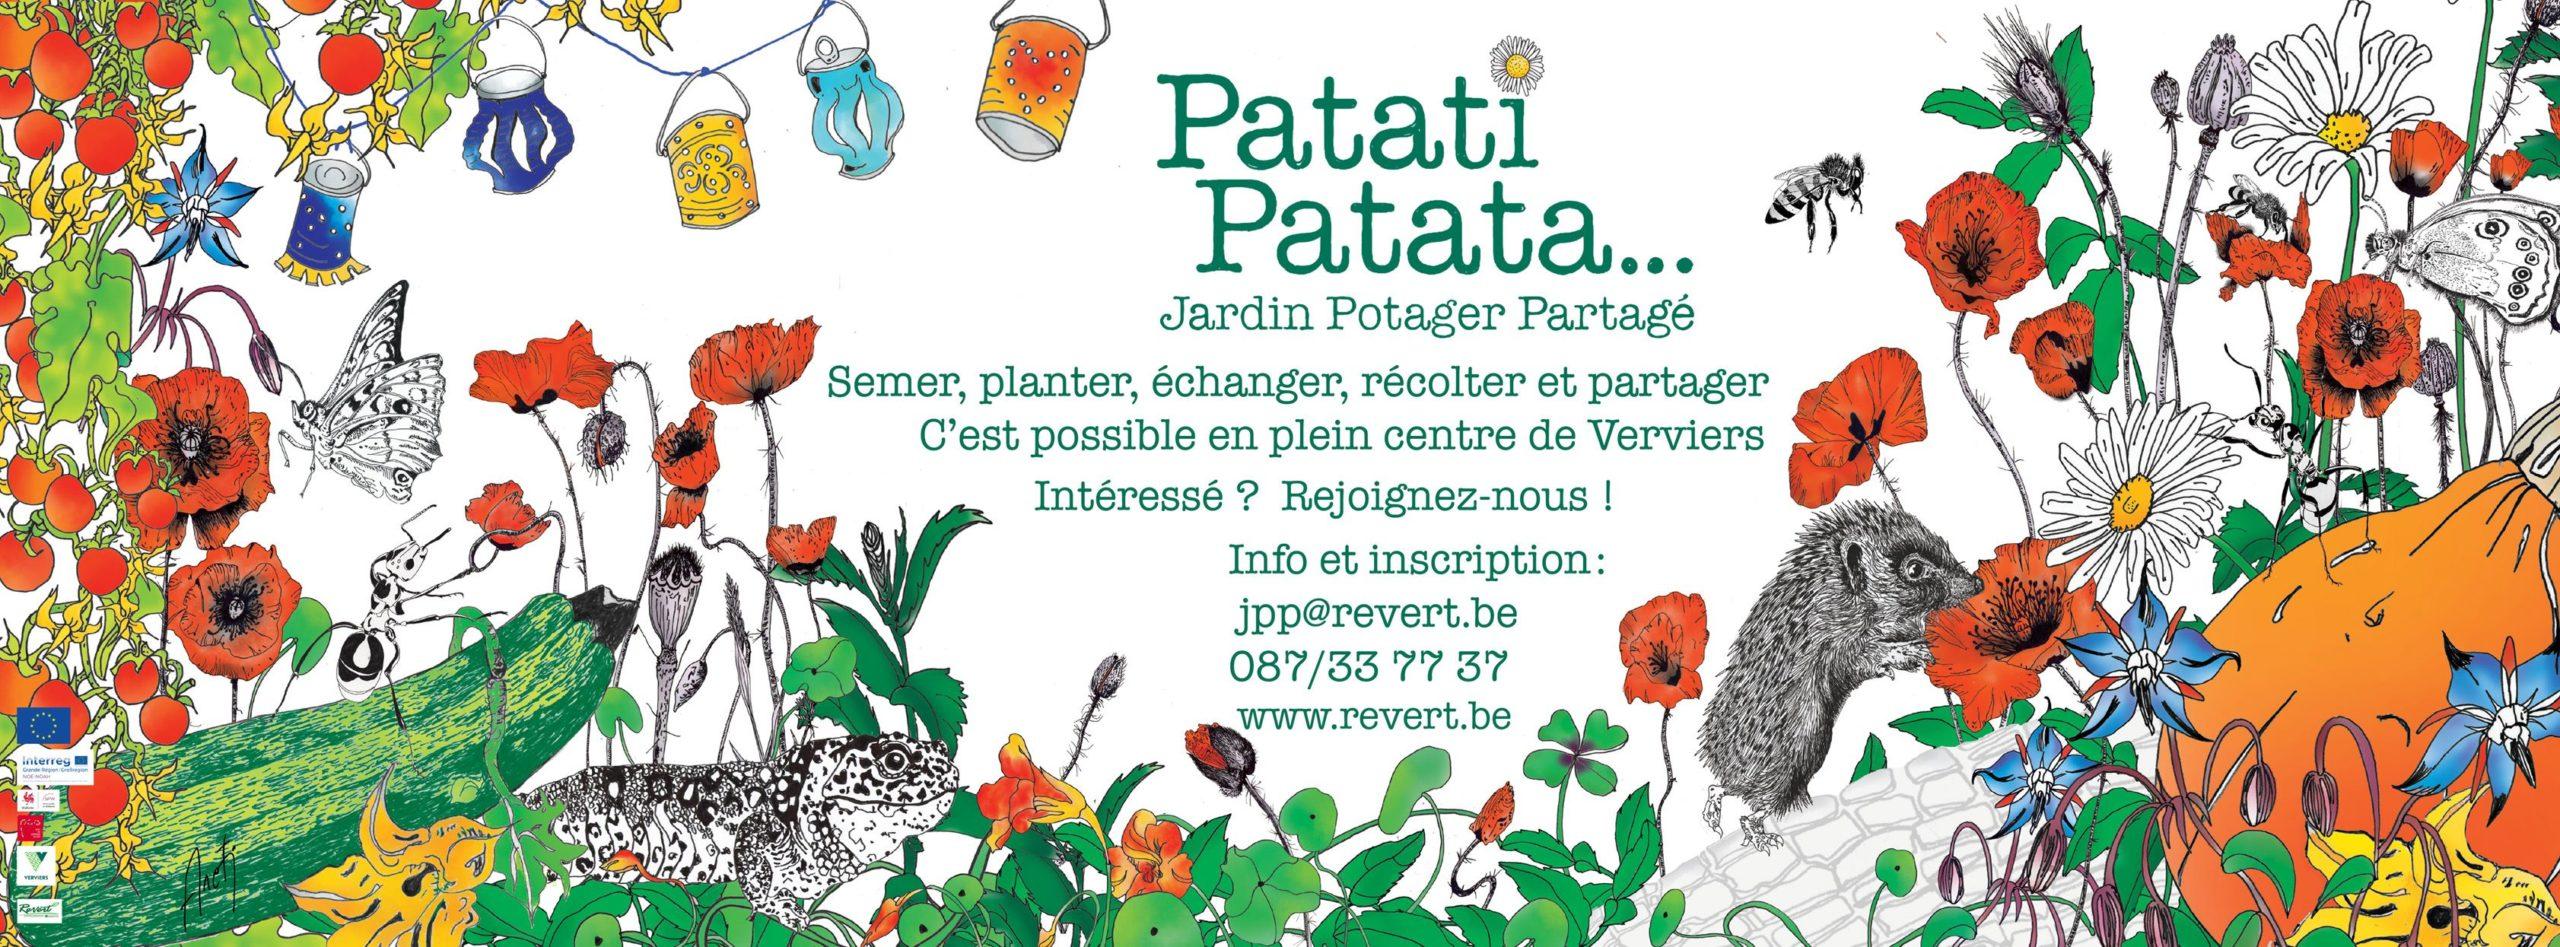 banderole Jardin Patati Patata